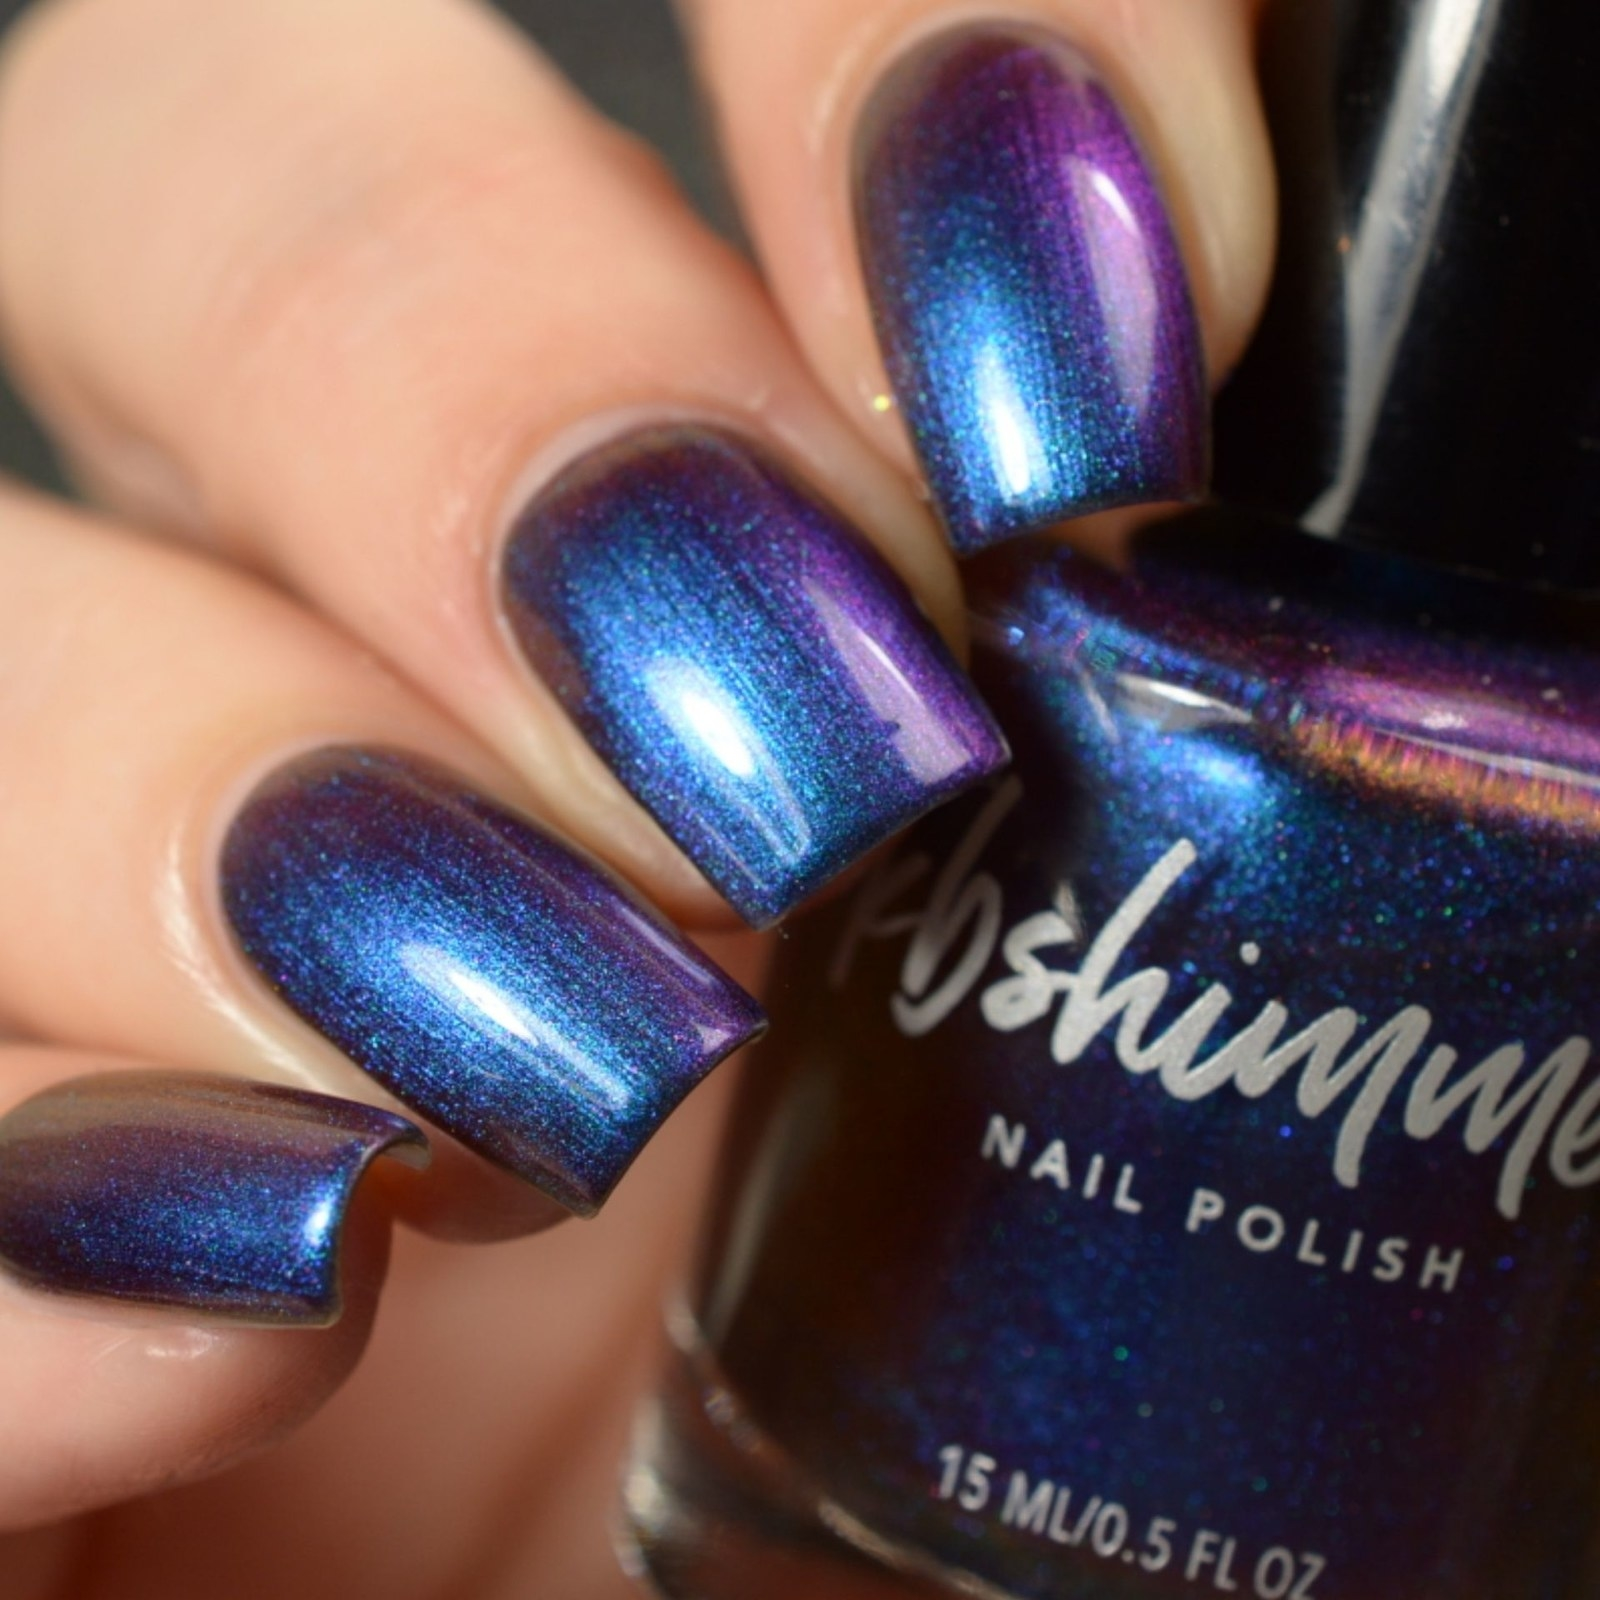 model holding the nail polish bottle with shiny iridescent blue nails